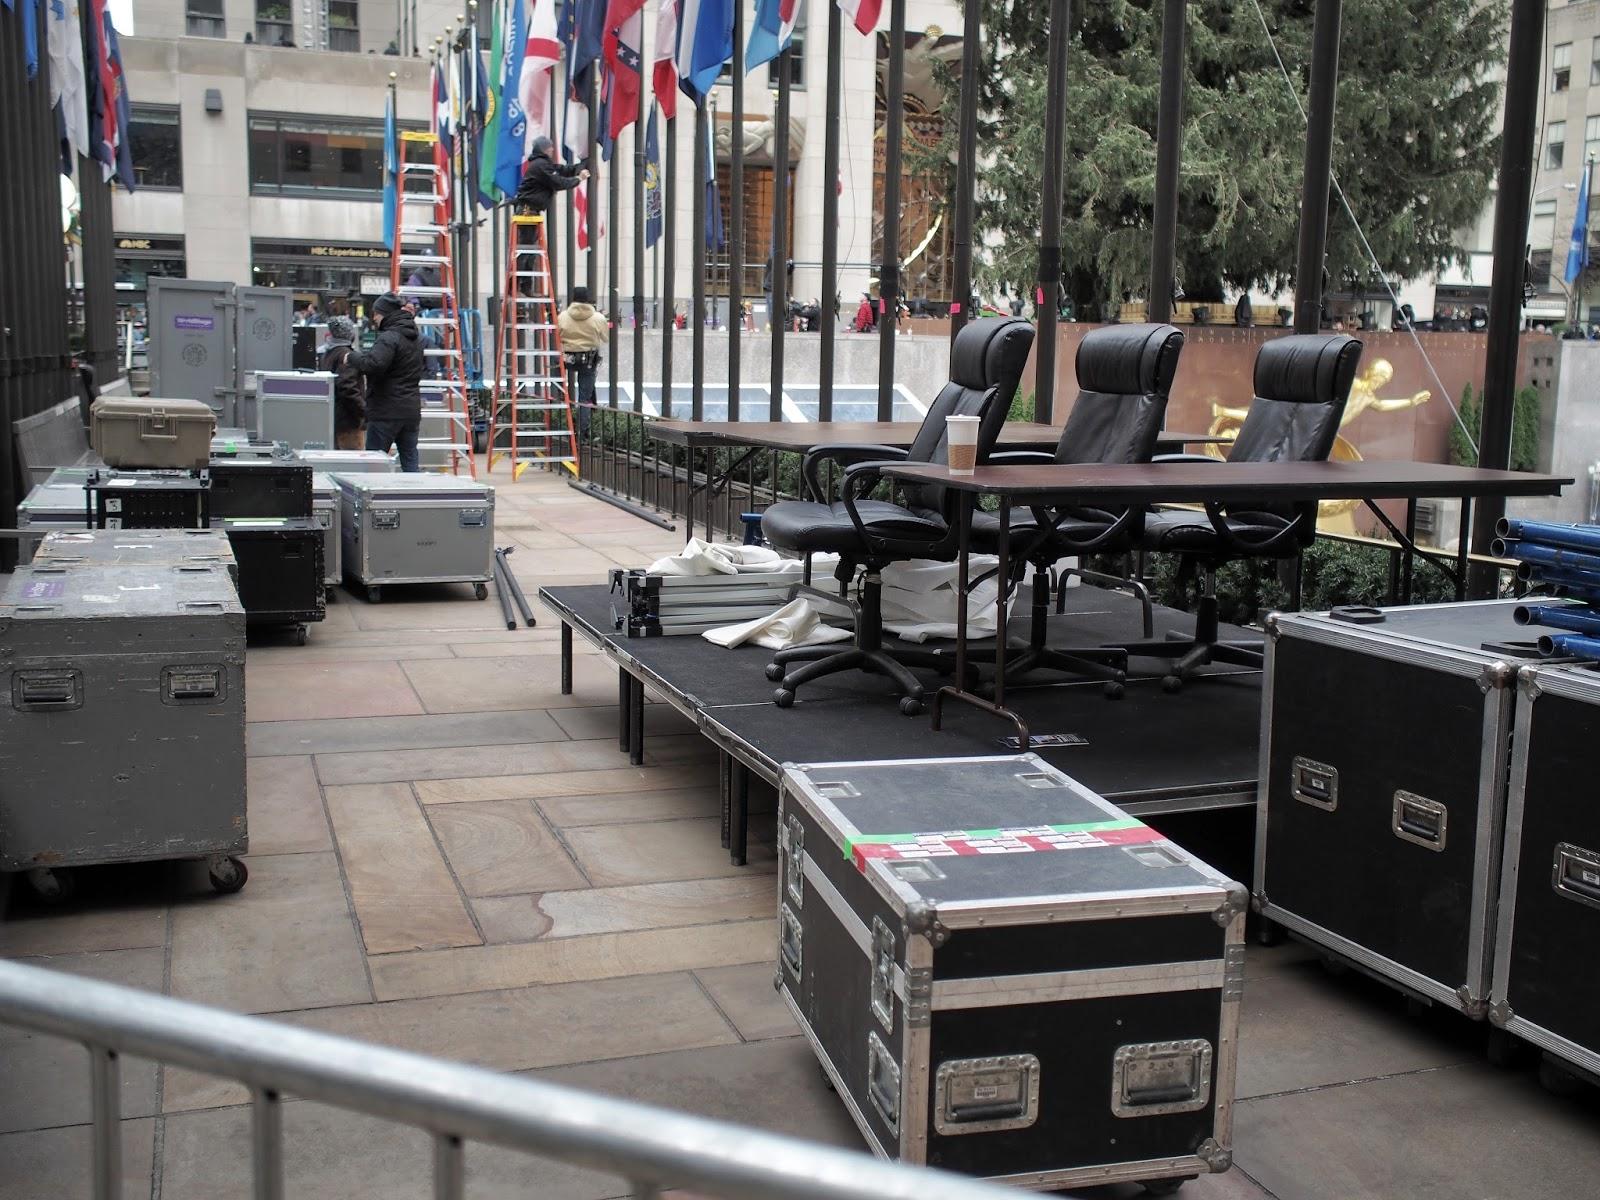 Getting Ready for the Big Show #gettingreadyforthebigshow #rockcenter #rockerfellercenter #christmastree 2014